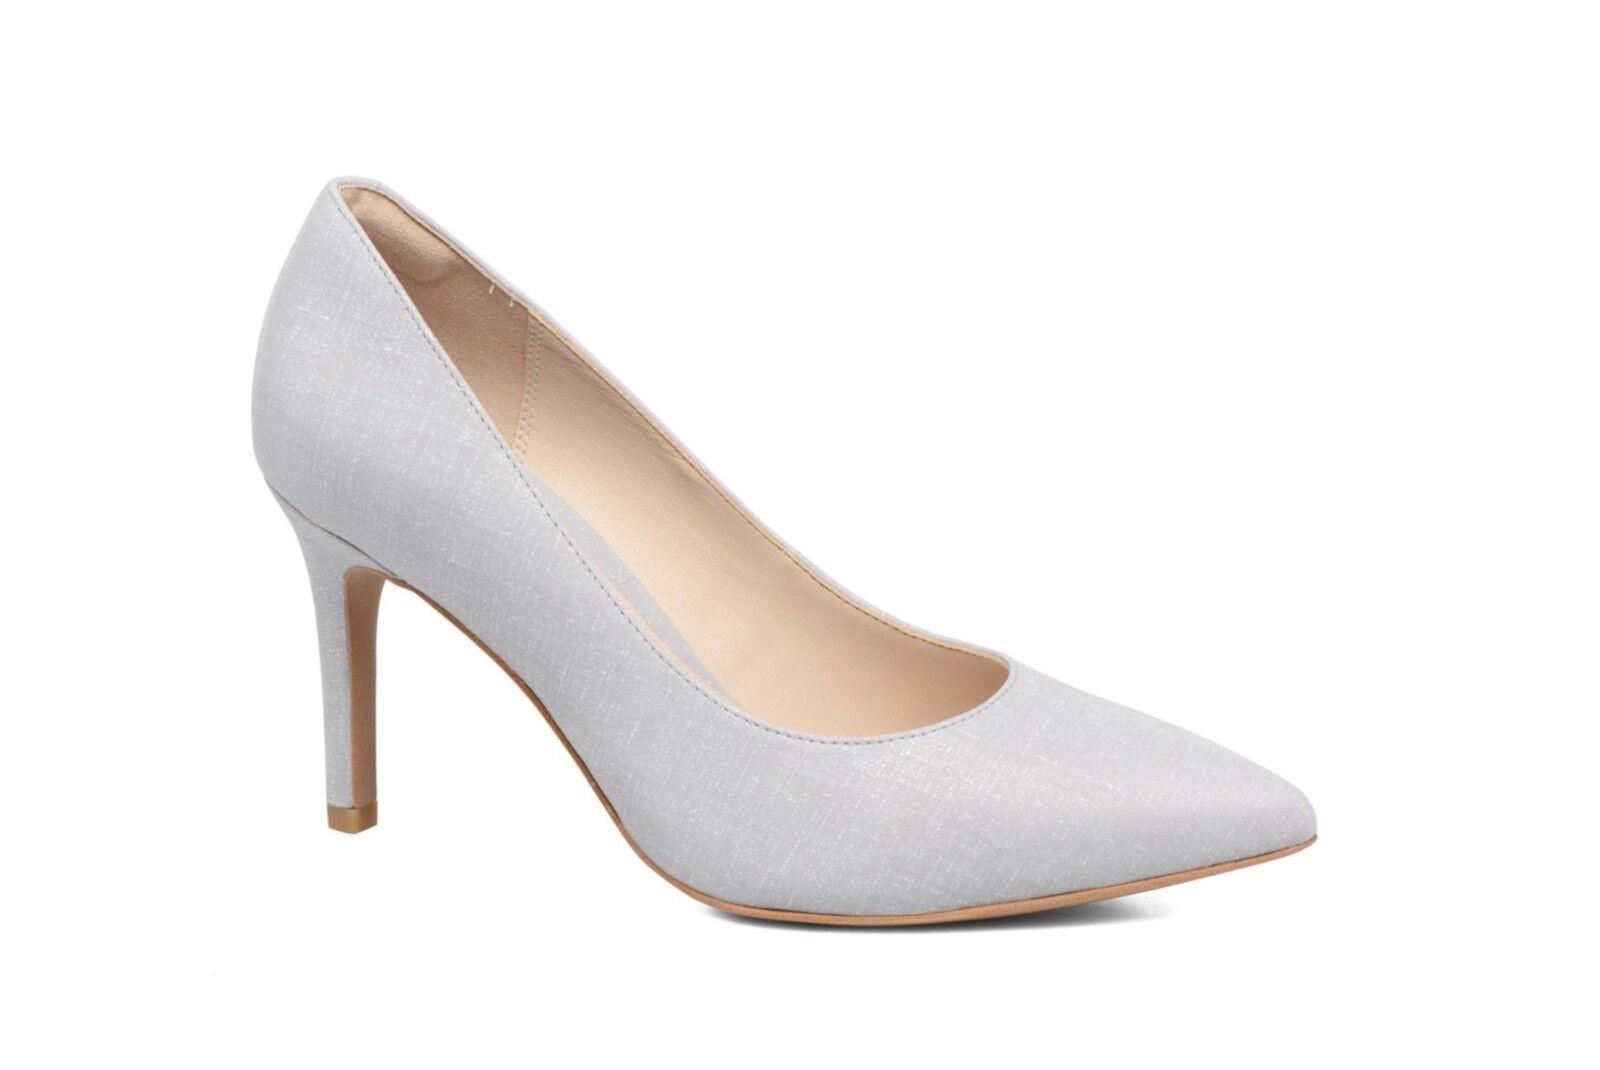 Clarks Dinah Keer shoes stiletto shoes Keer size 7 57fb3e